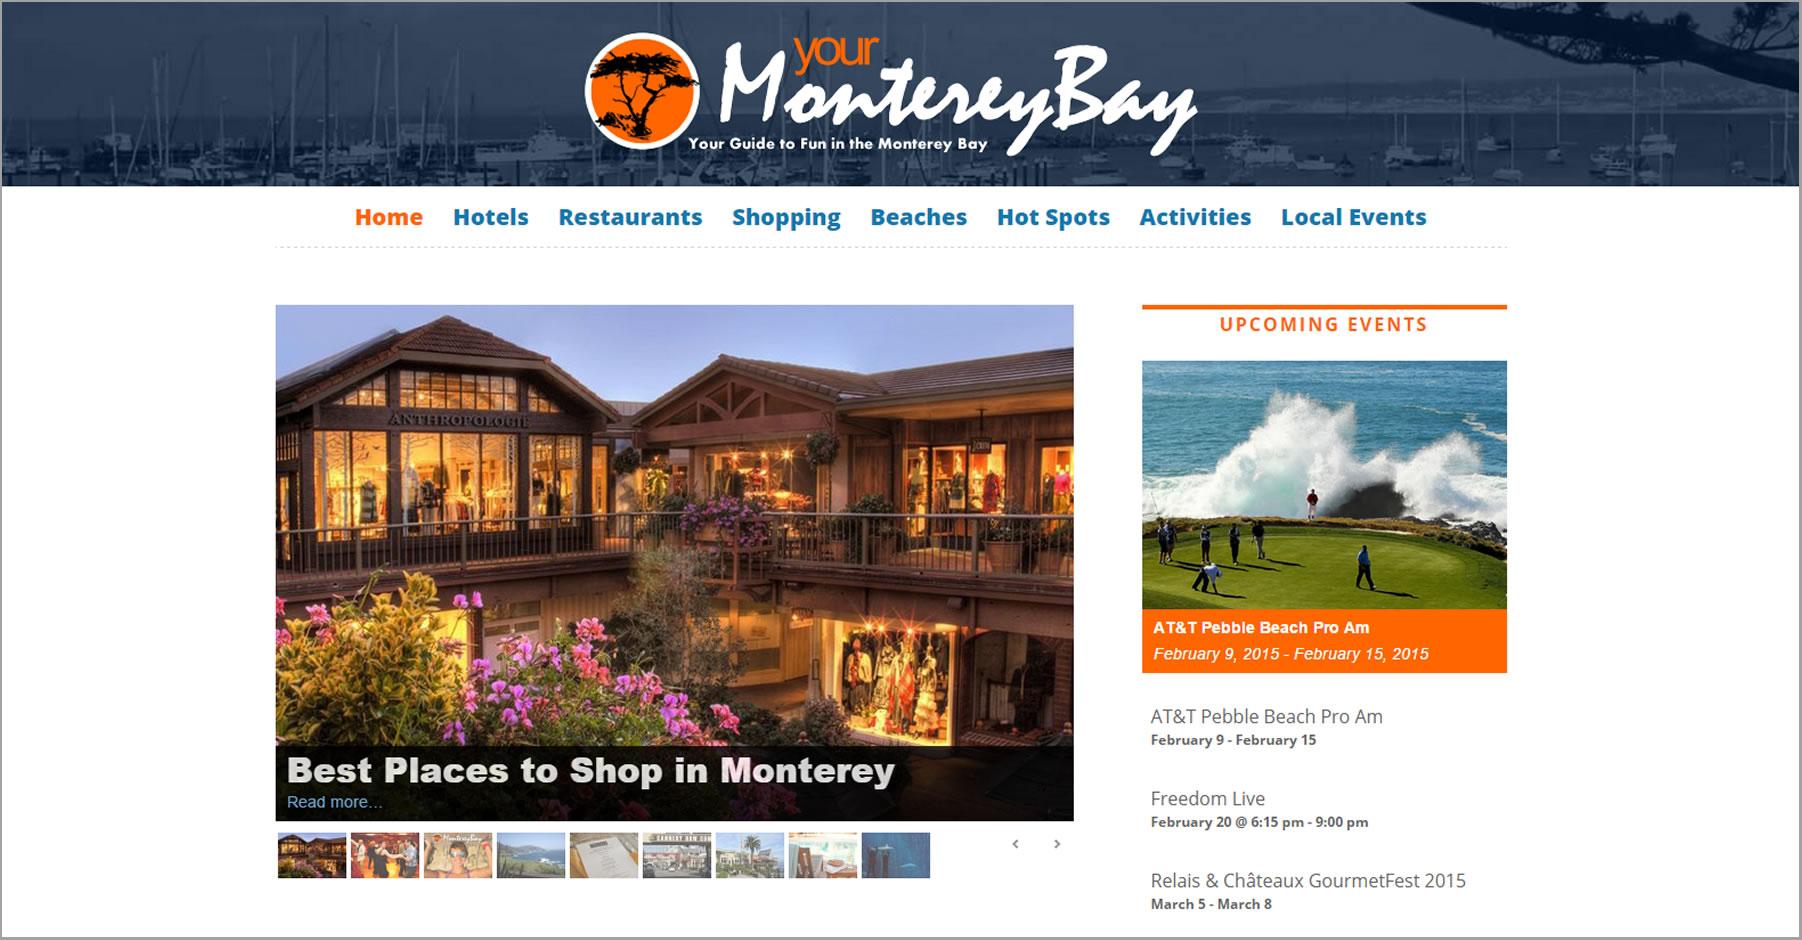 Your Monterey Bay